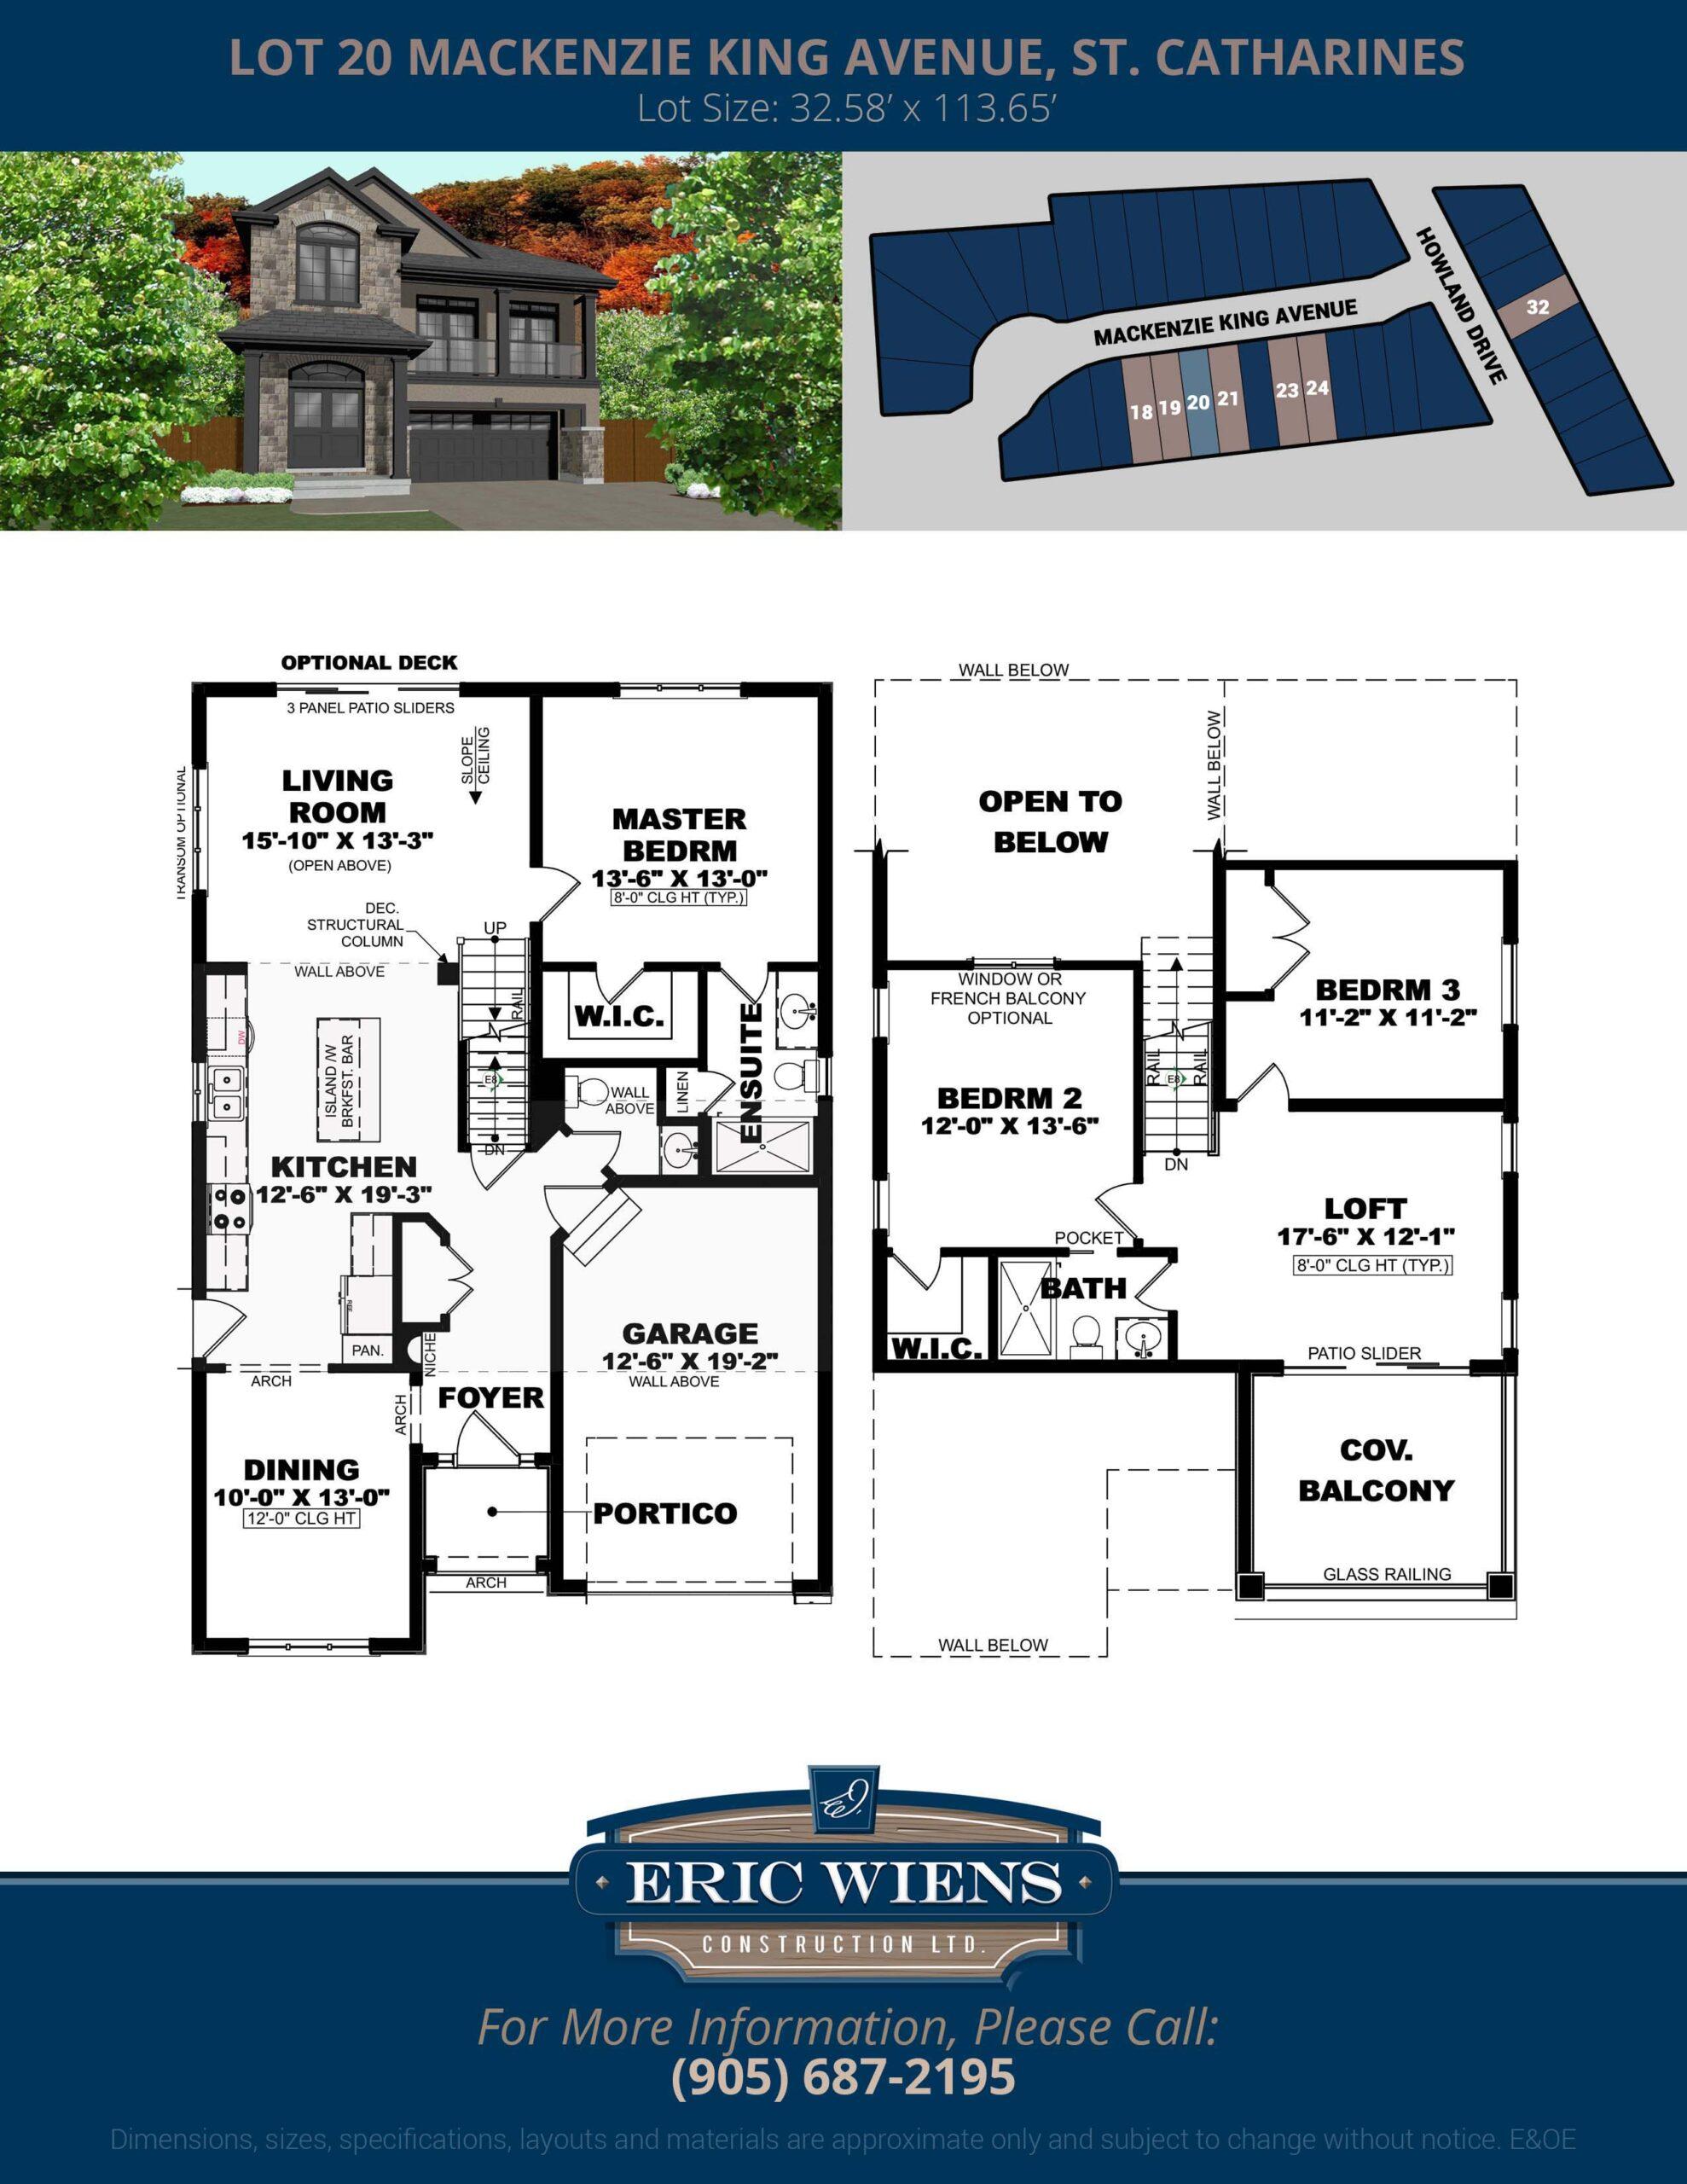 Lot 20 Mackenzie King Avenue Floor Plan